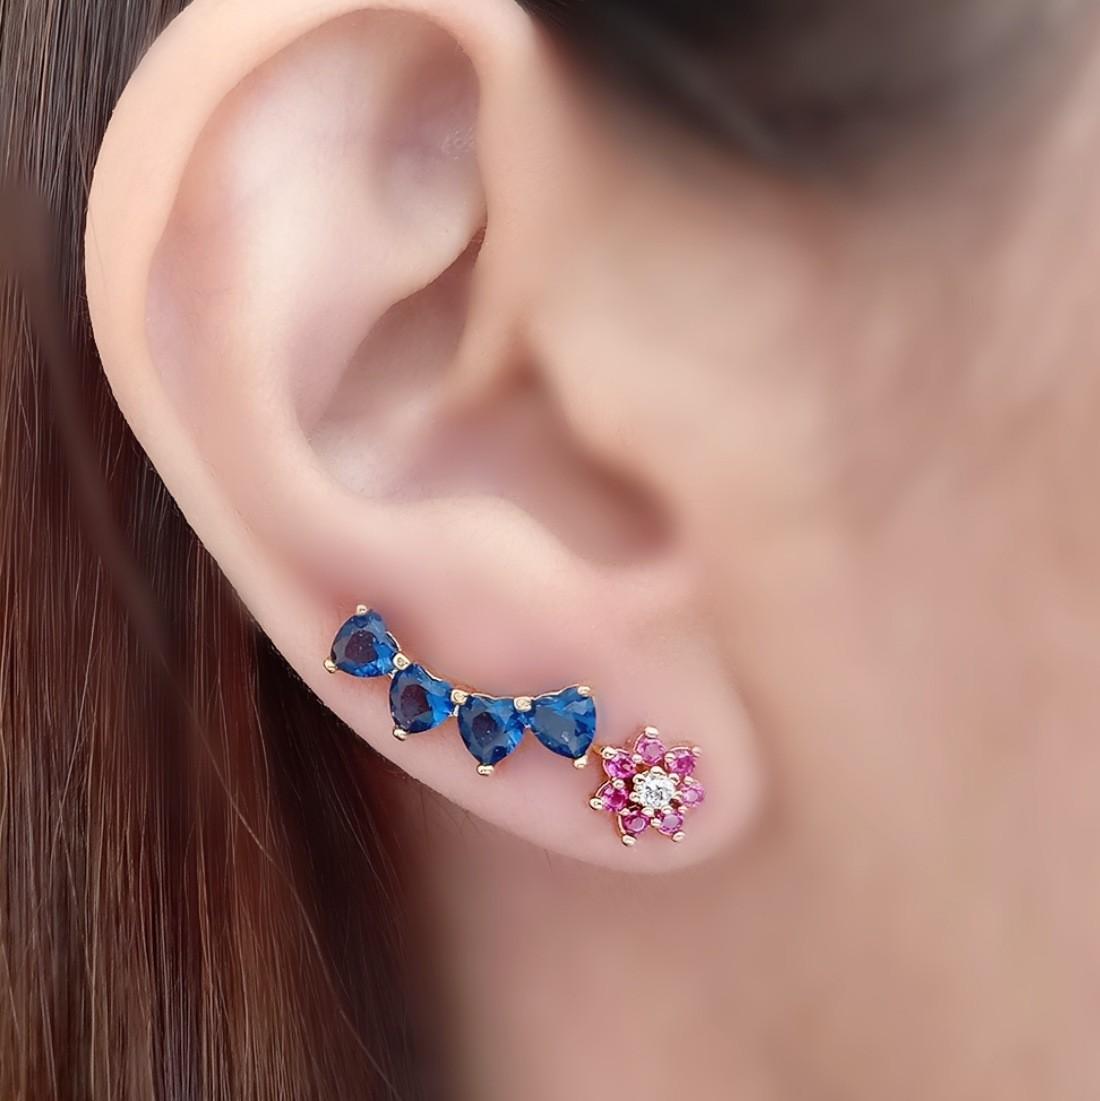 Mini Ear Cuff Corações de Zircônia Azul Safira Semijoia em Ouro 18K  - Soloyou